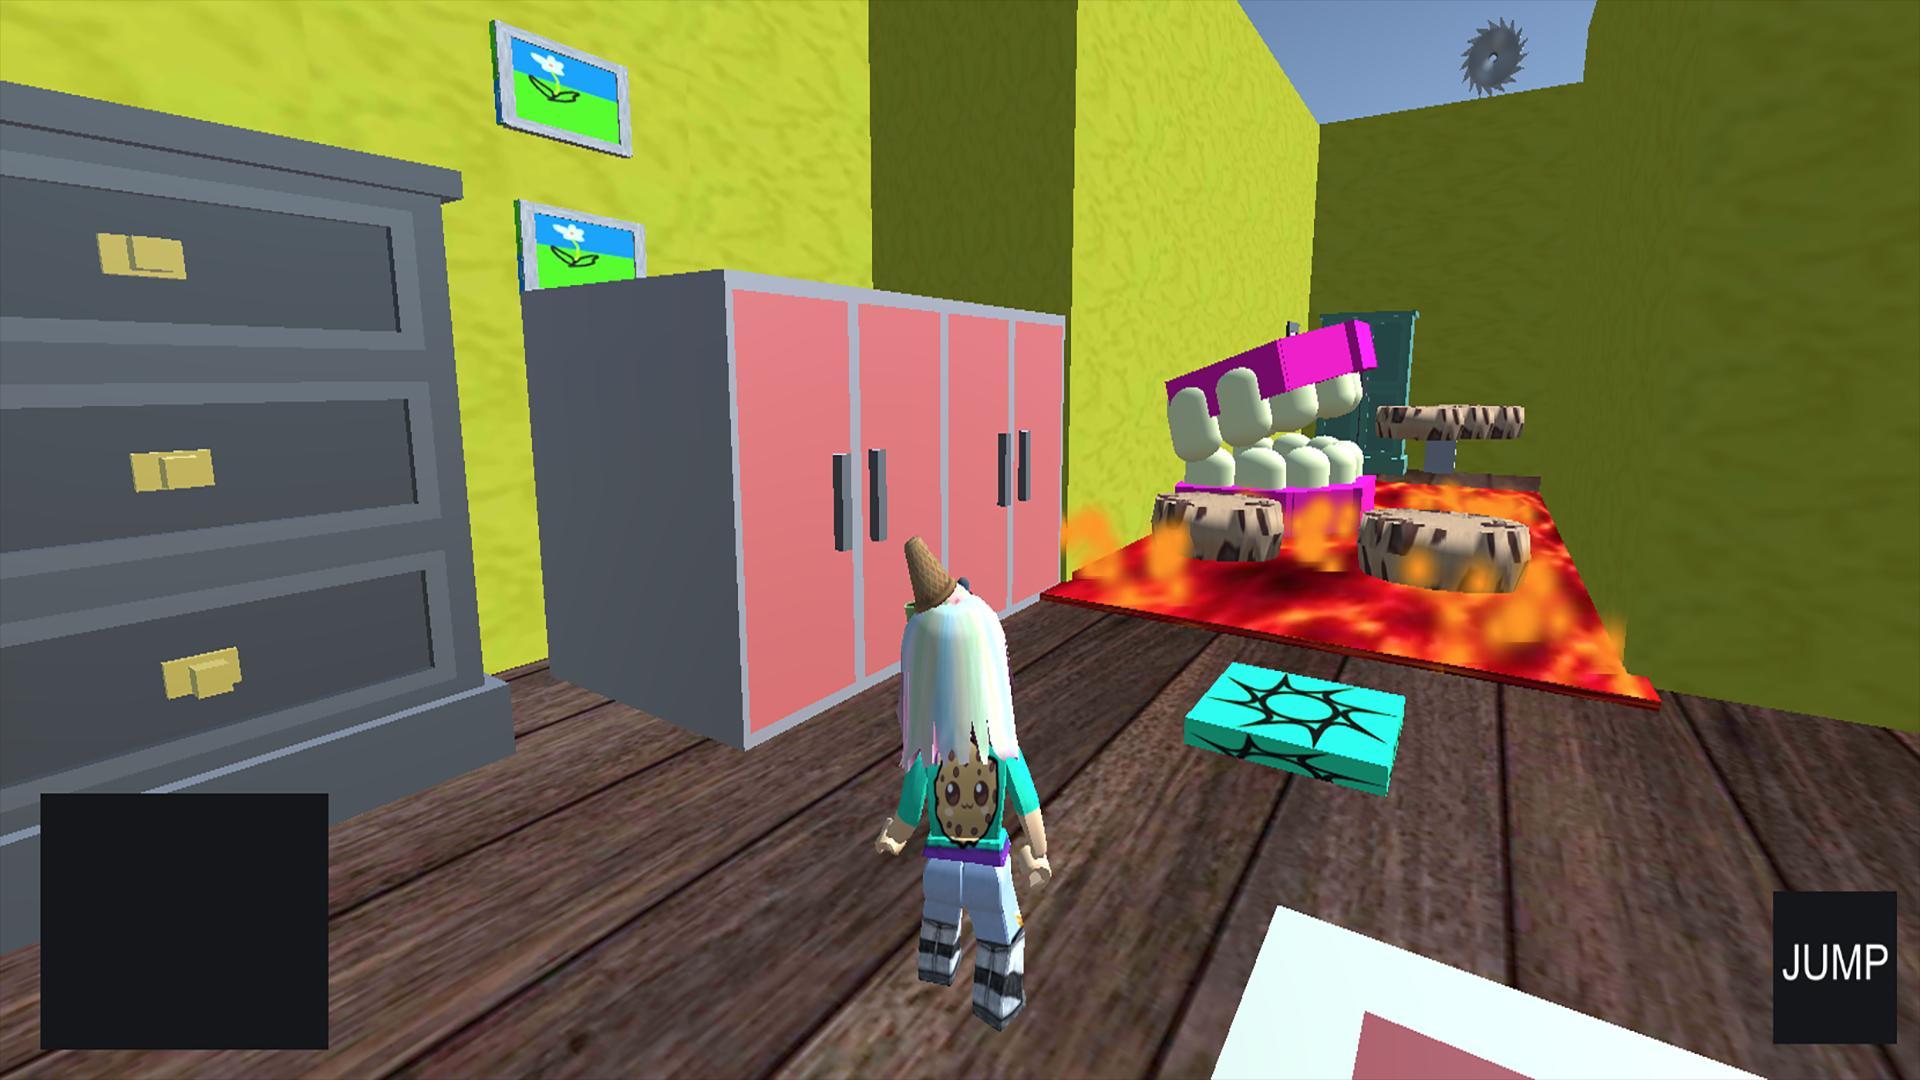 Crazy cookie swirl c robIox adventure 1.2 Screenshot 12